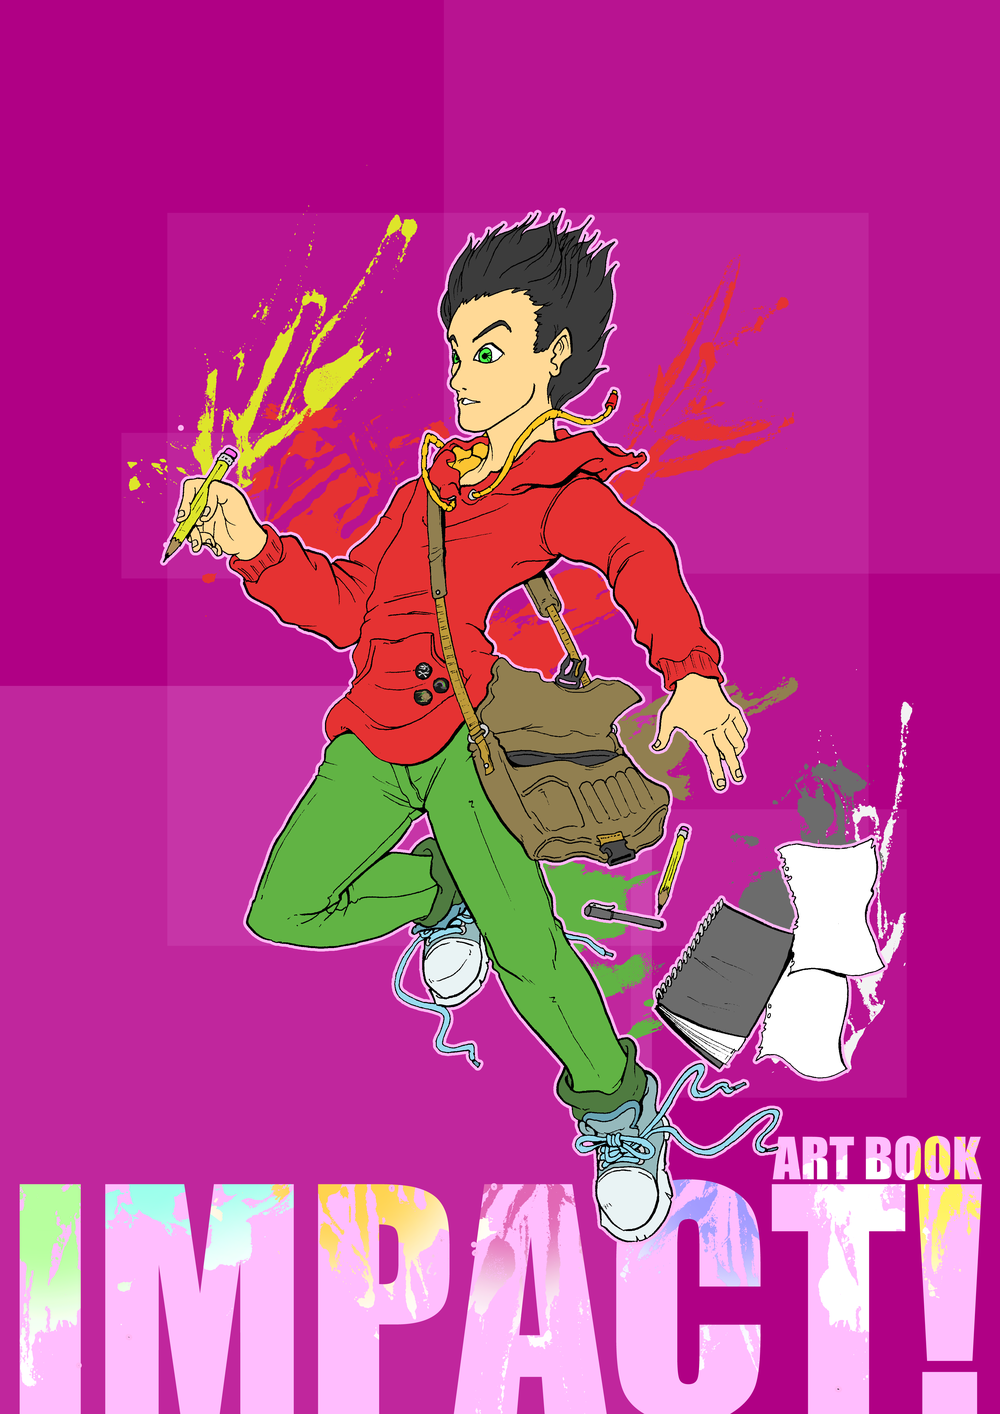 IMPACT! ART BOOK